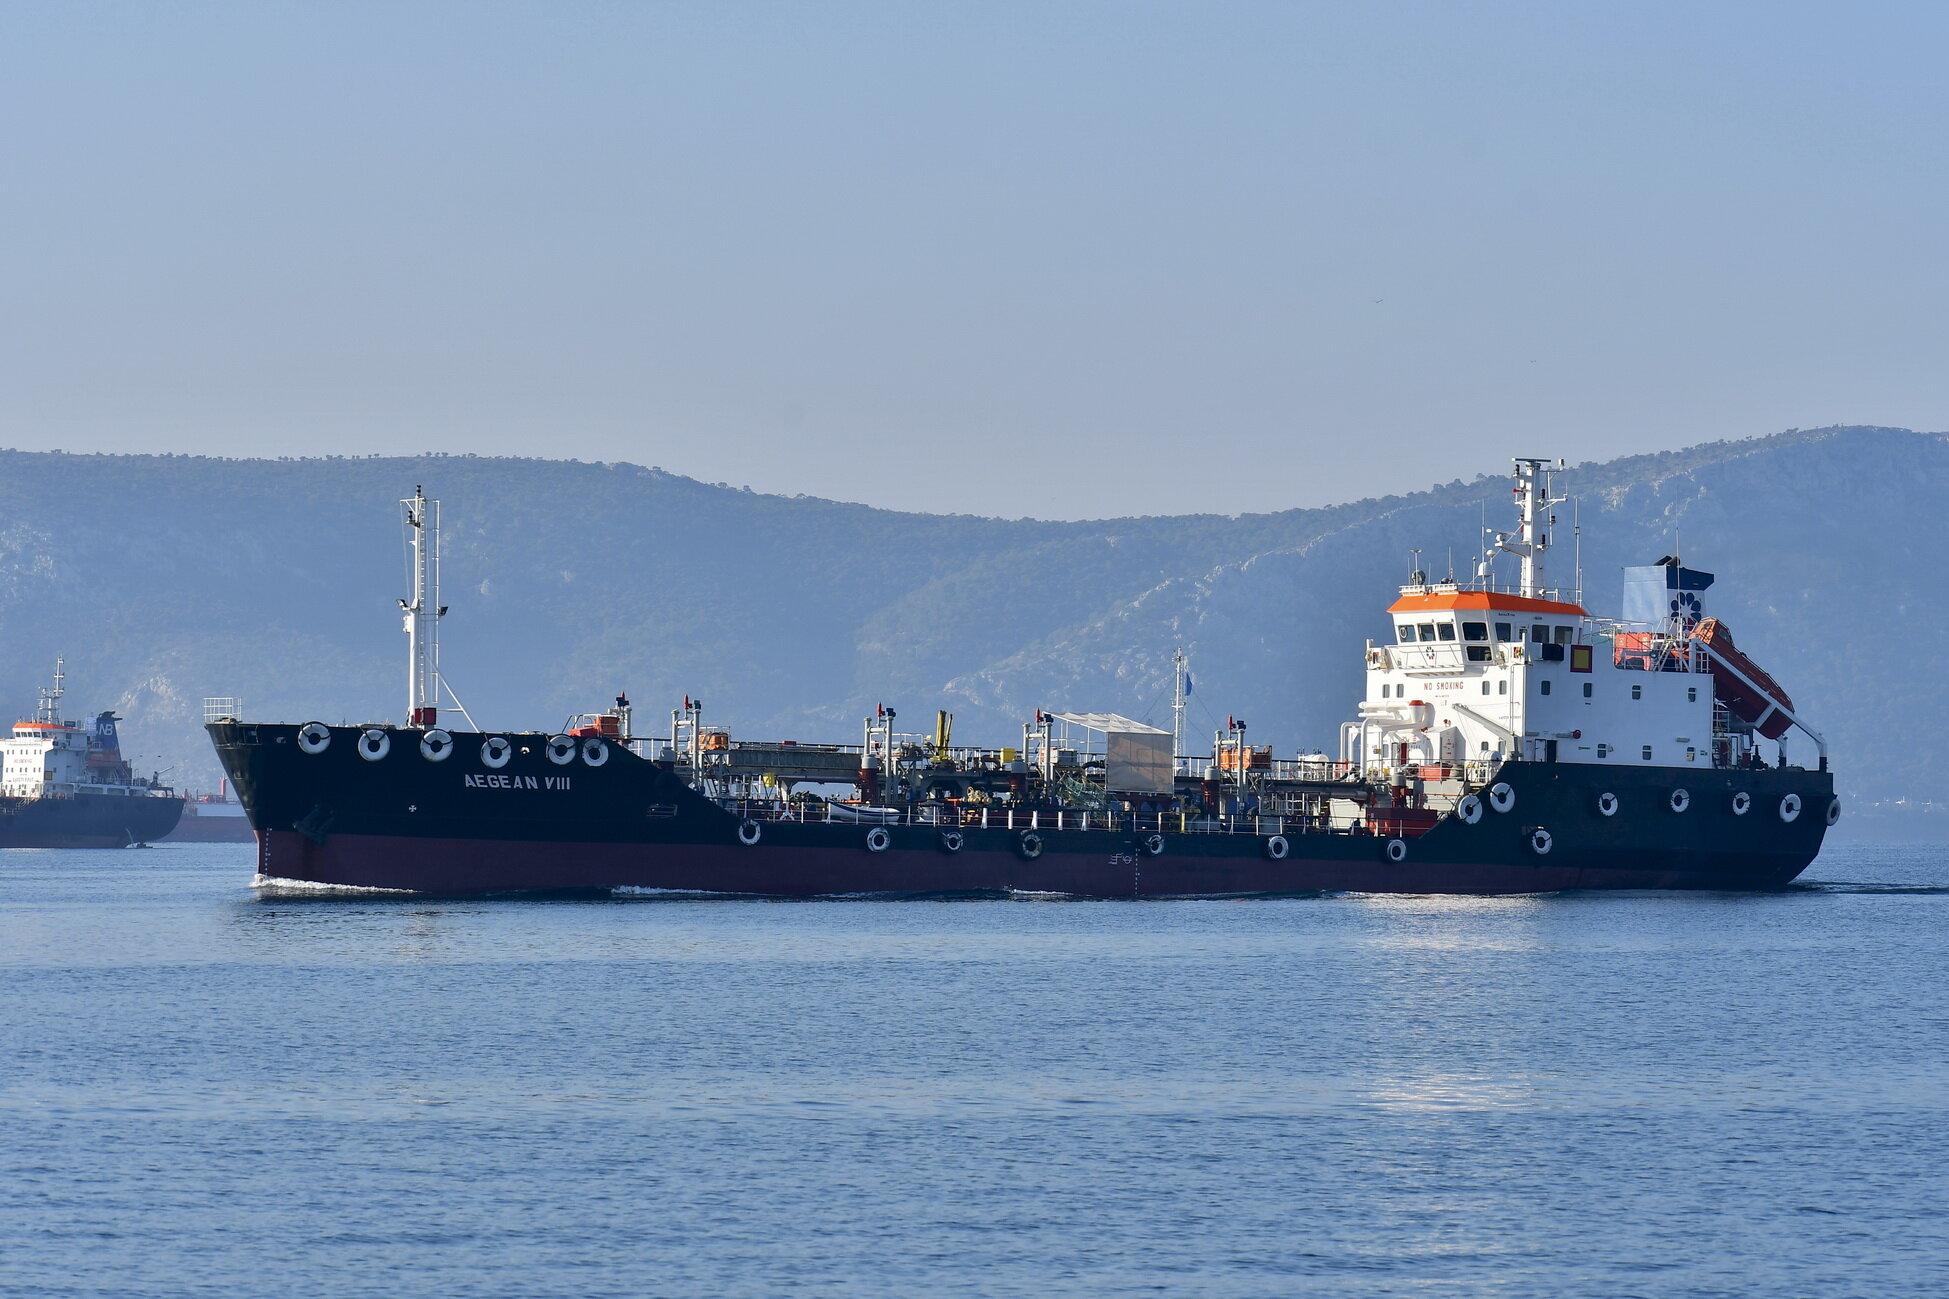 Aegean VIII_10-02-19_Eleusis